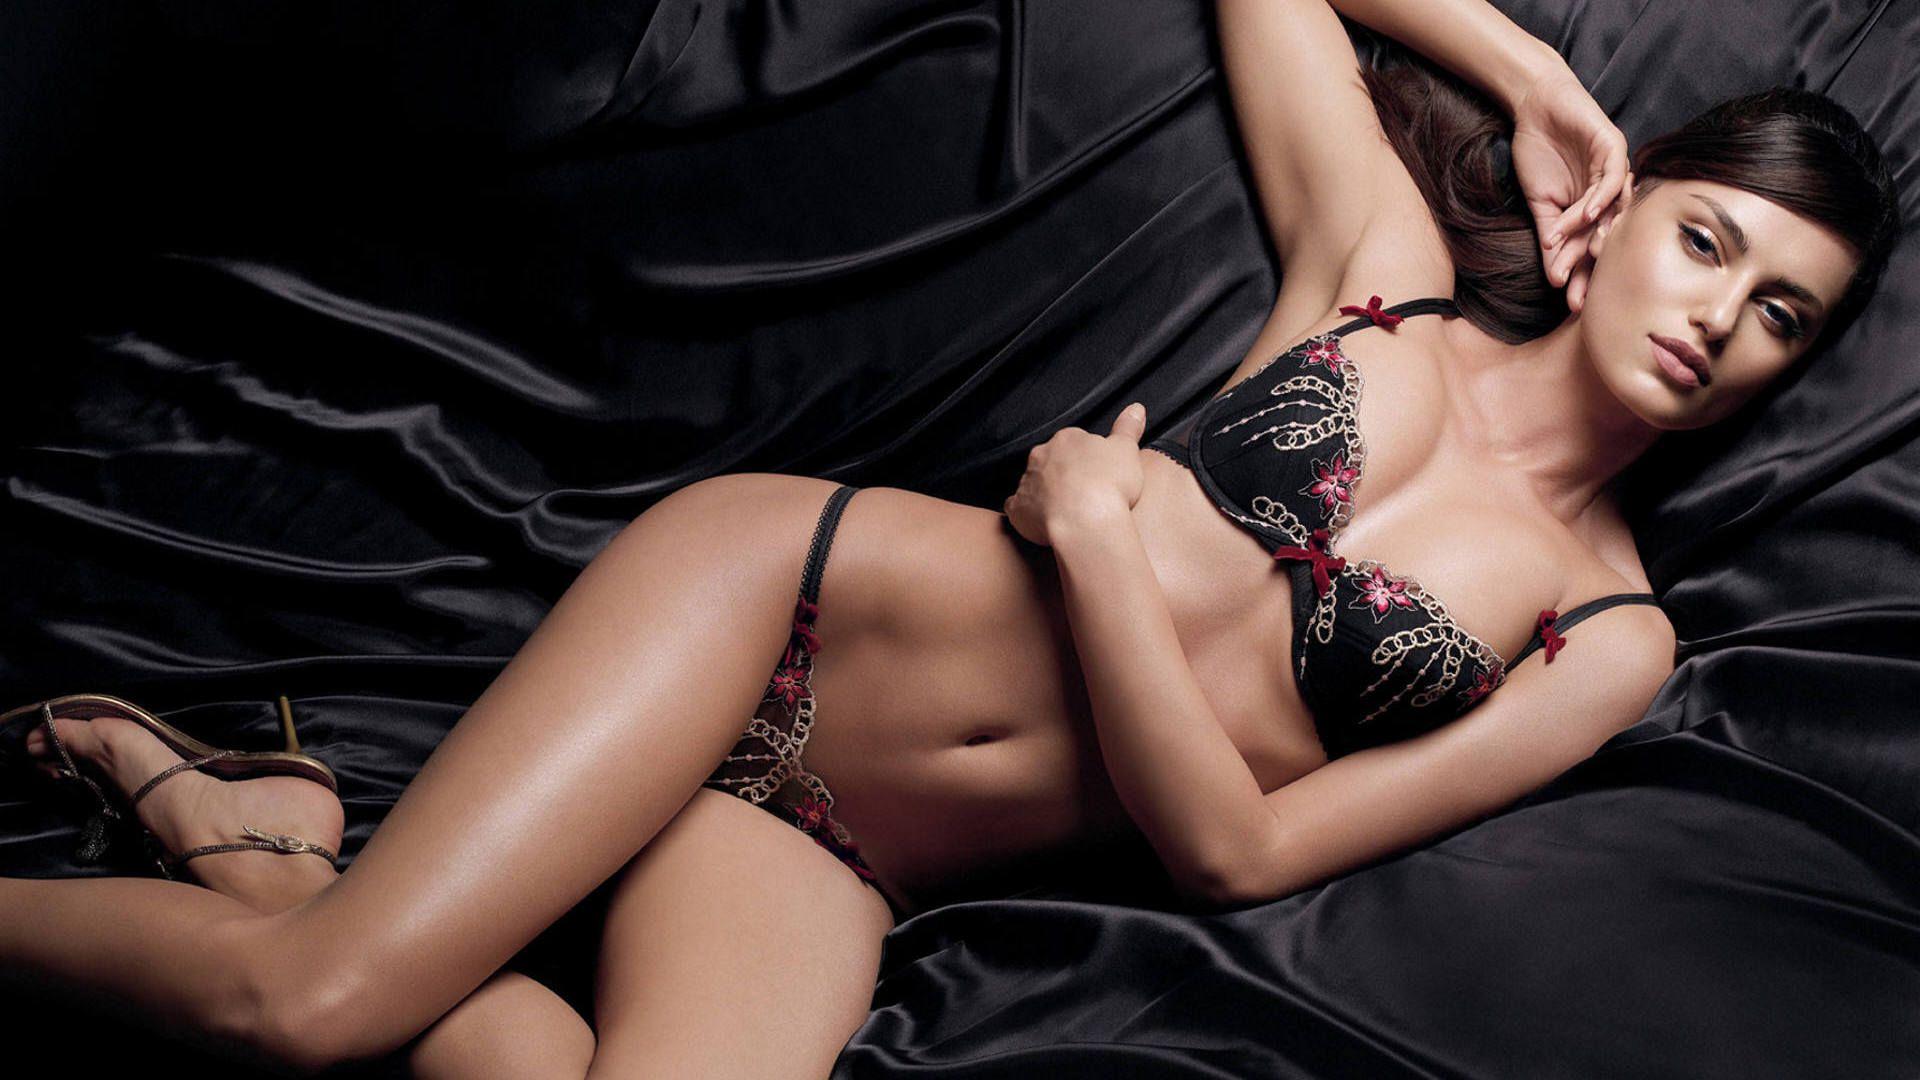 Nikki leigh playboy nude